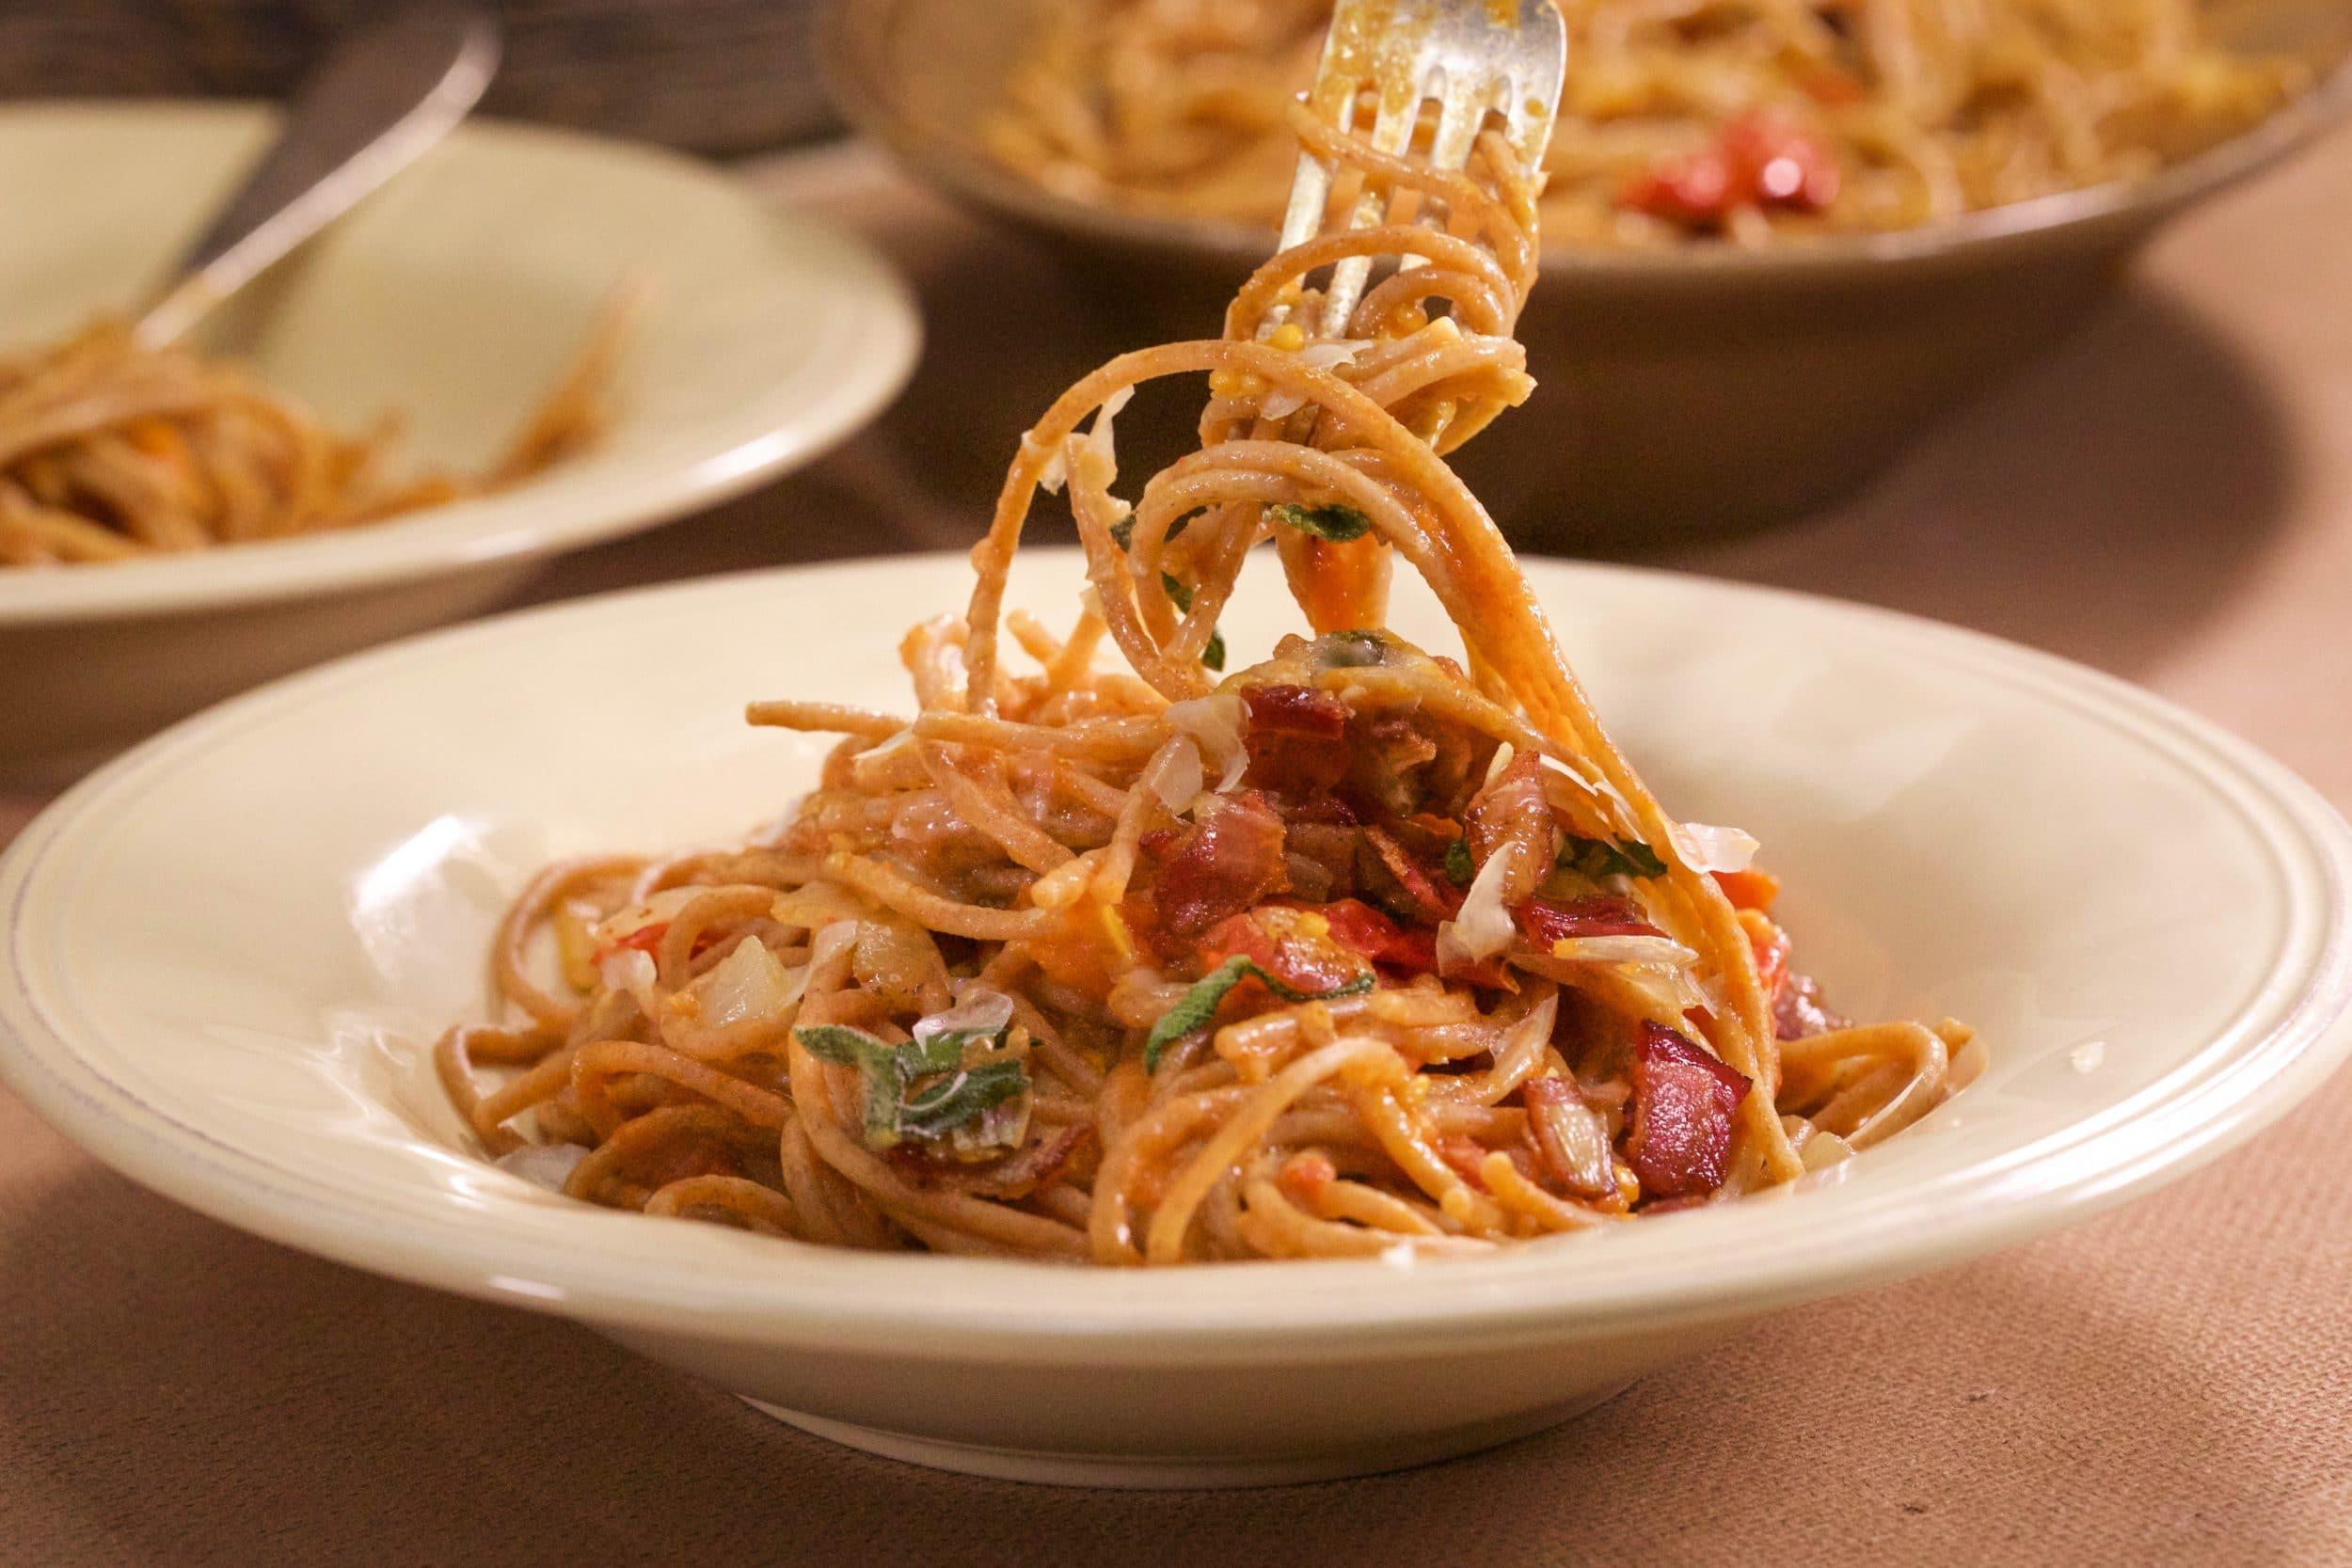 Bacon and Bay Tomato Sauce on Brown Spaghetti